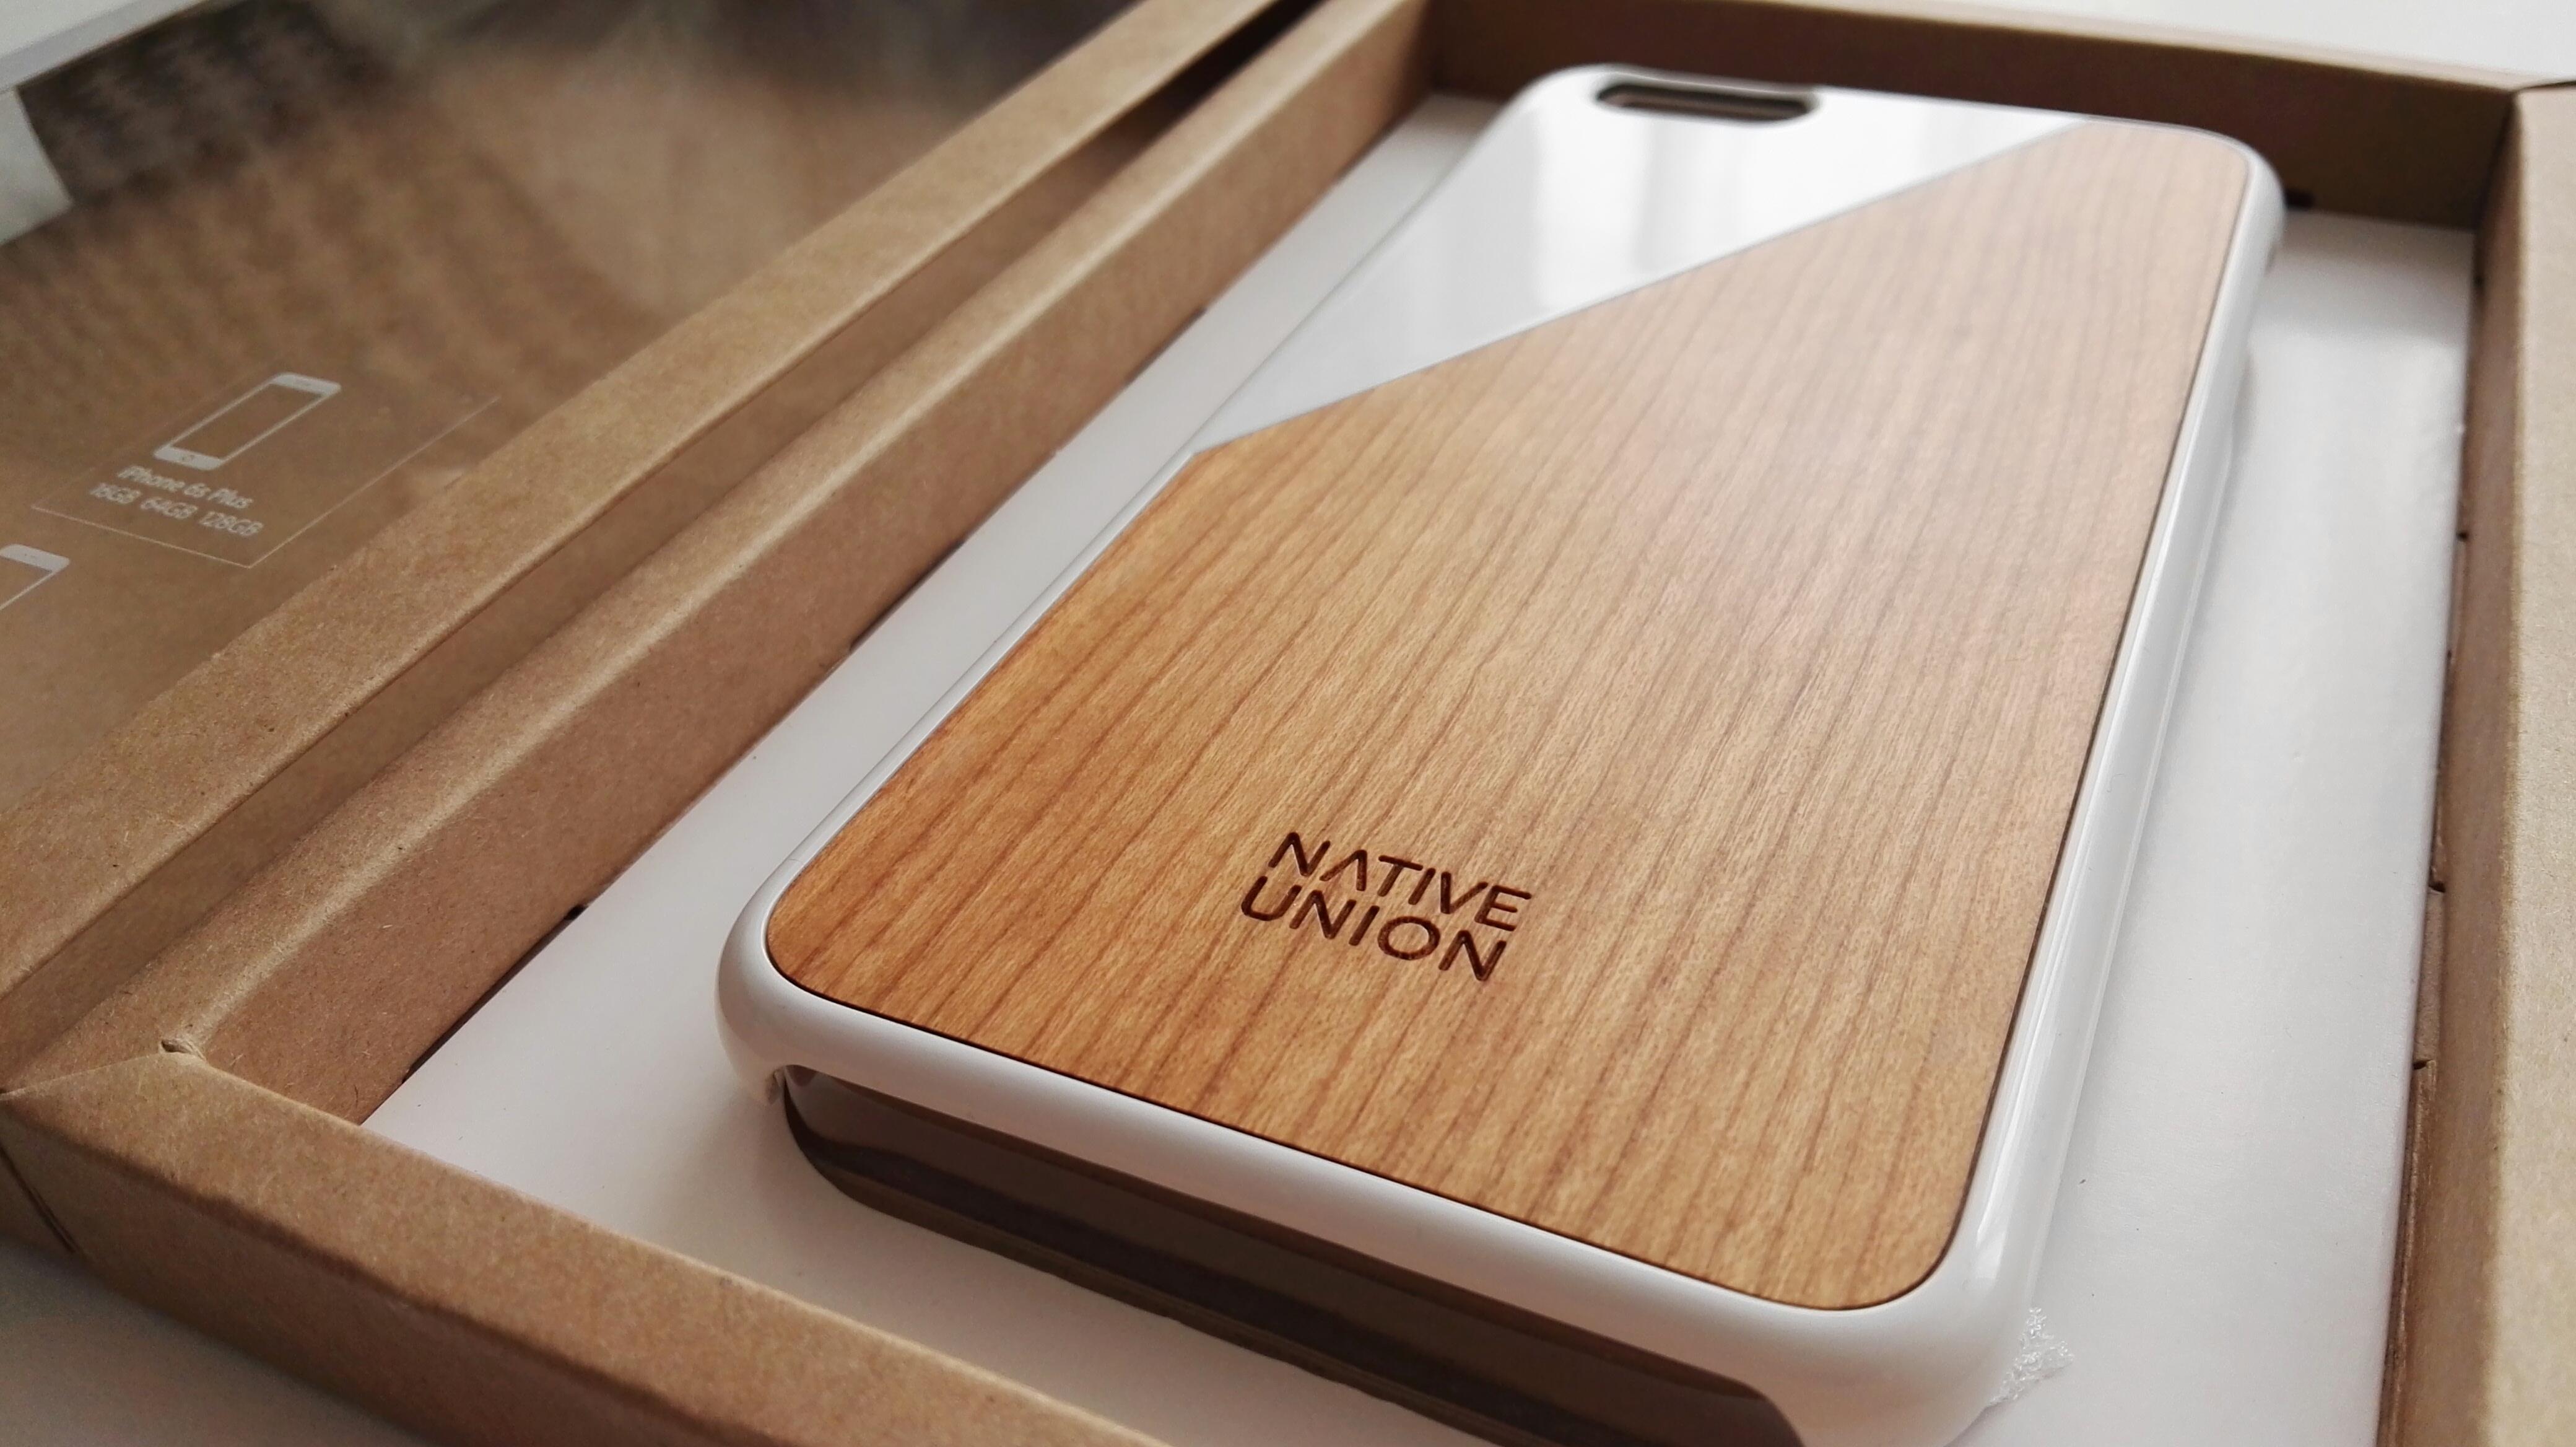 Funda de madera Native Union para iPhone 6s Plus 05